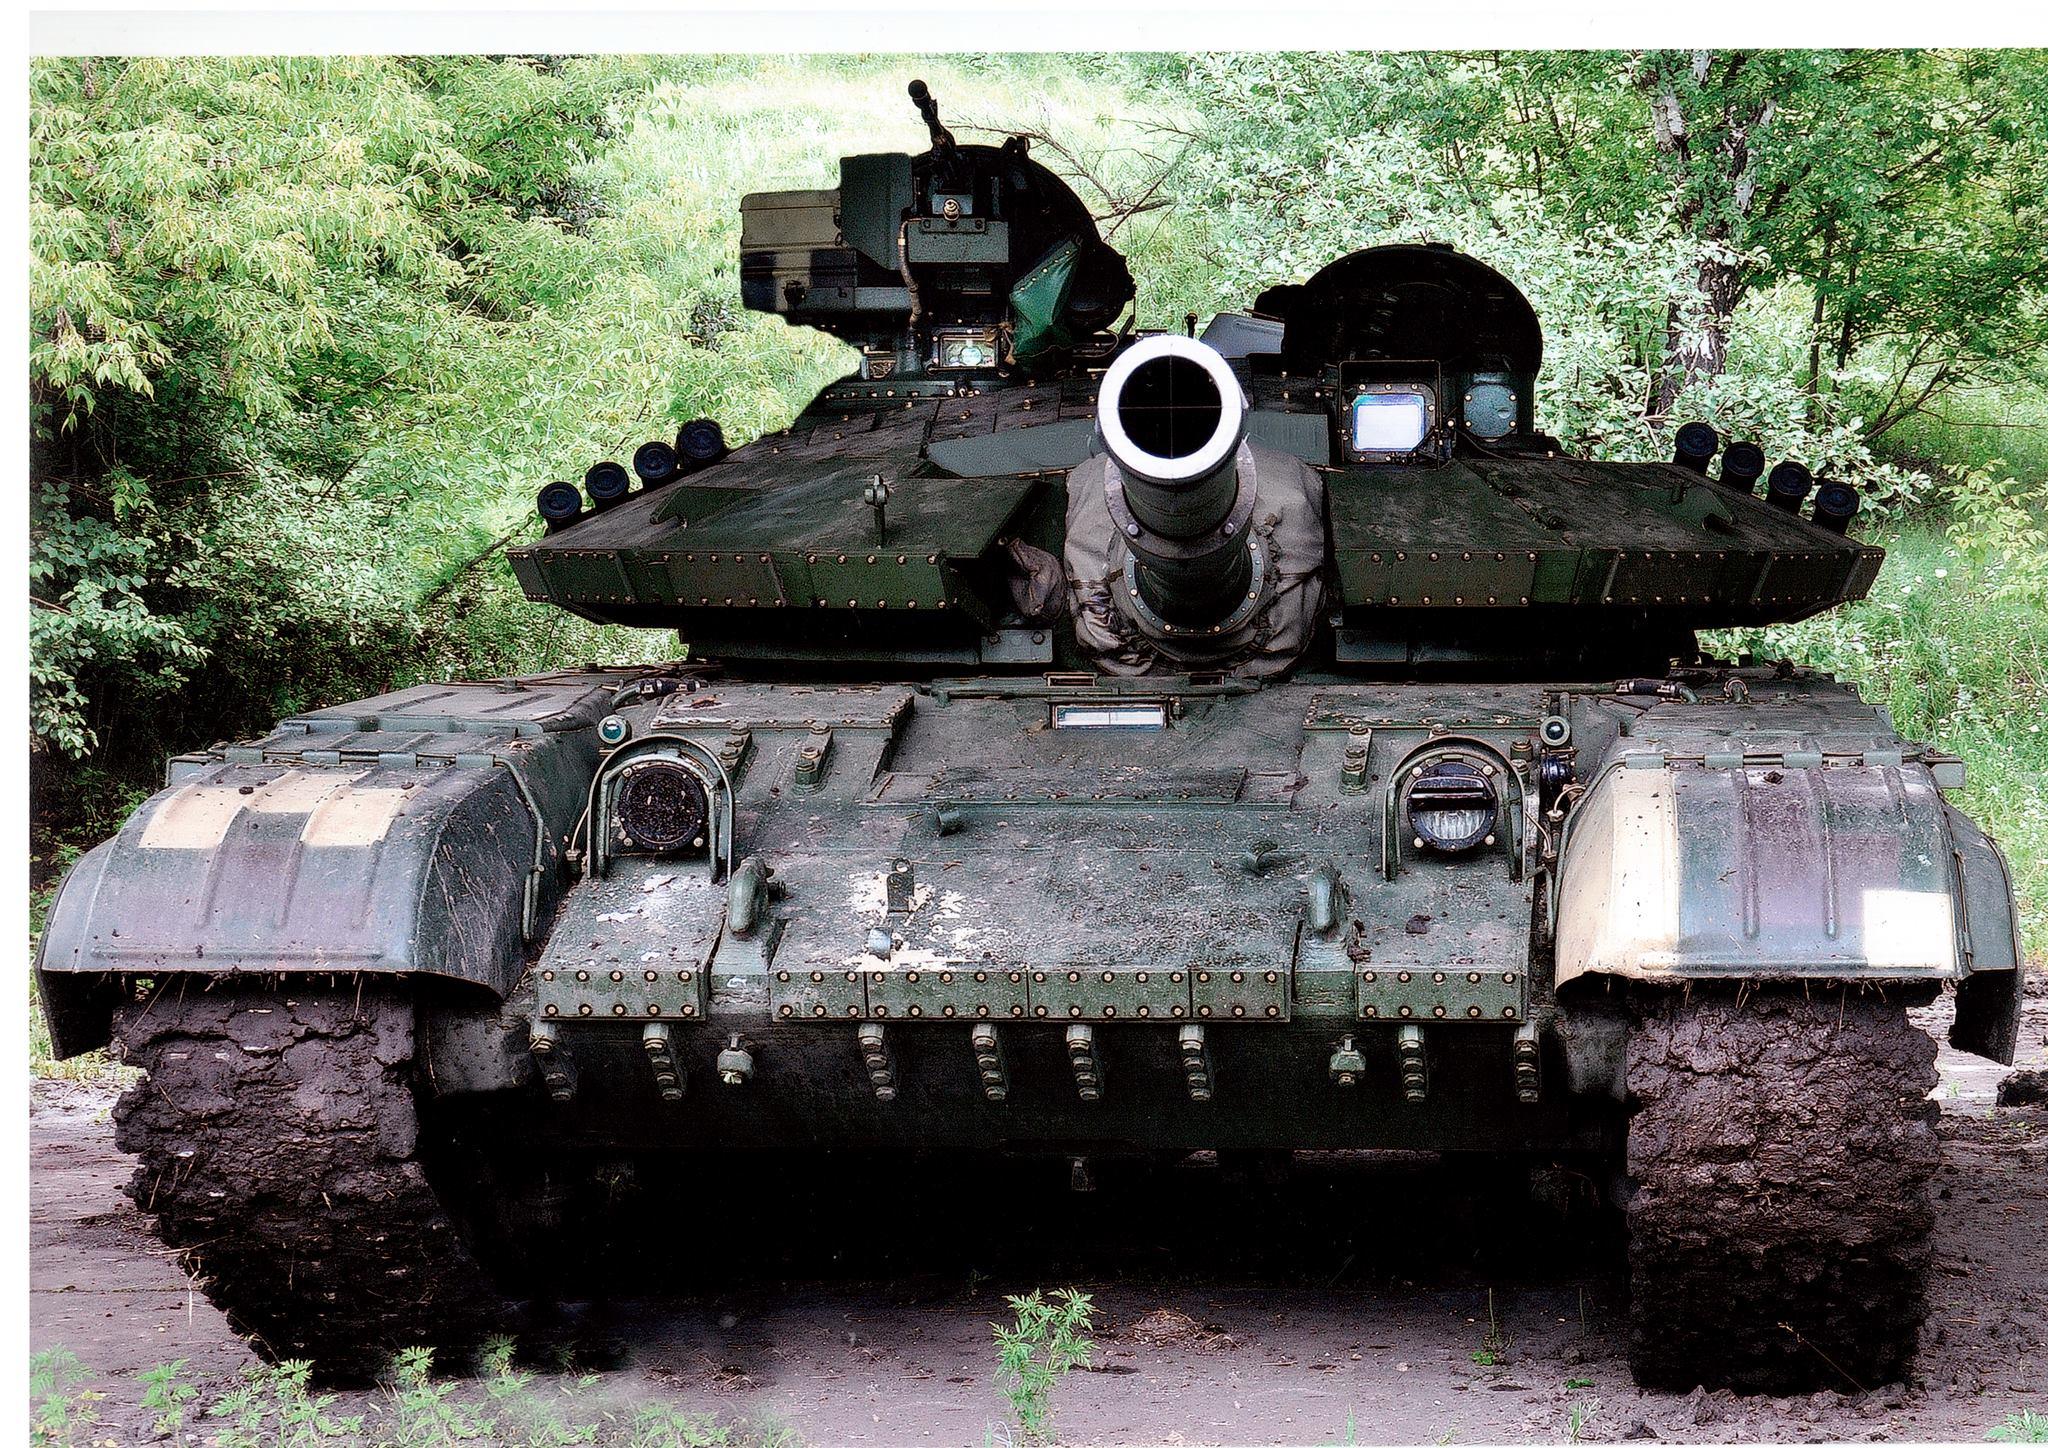 Армия купила новую боевику технику